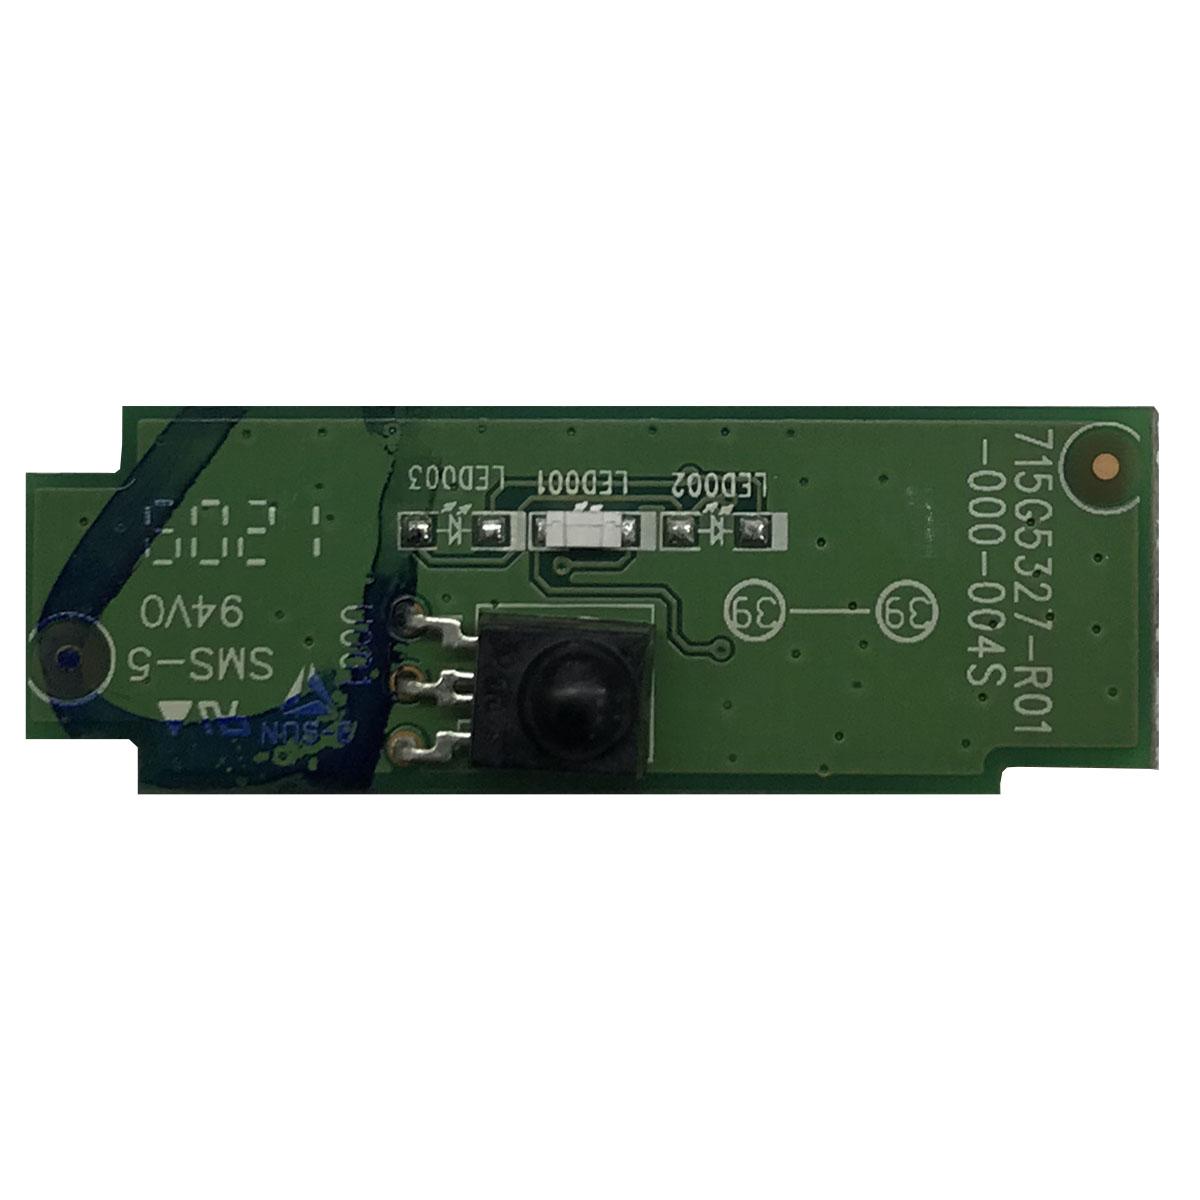 ИК-датчик 715G5327-R01-000-004S для Sharp LC-42LE40RU